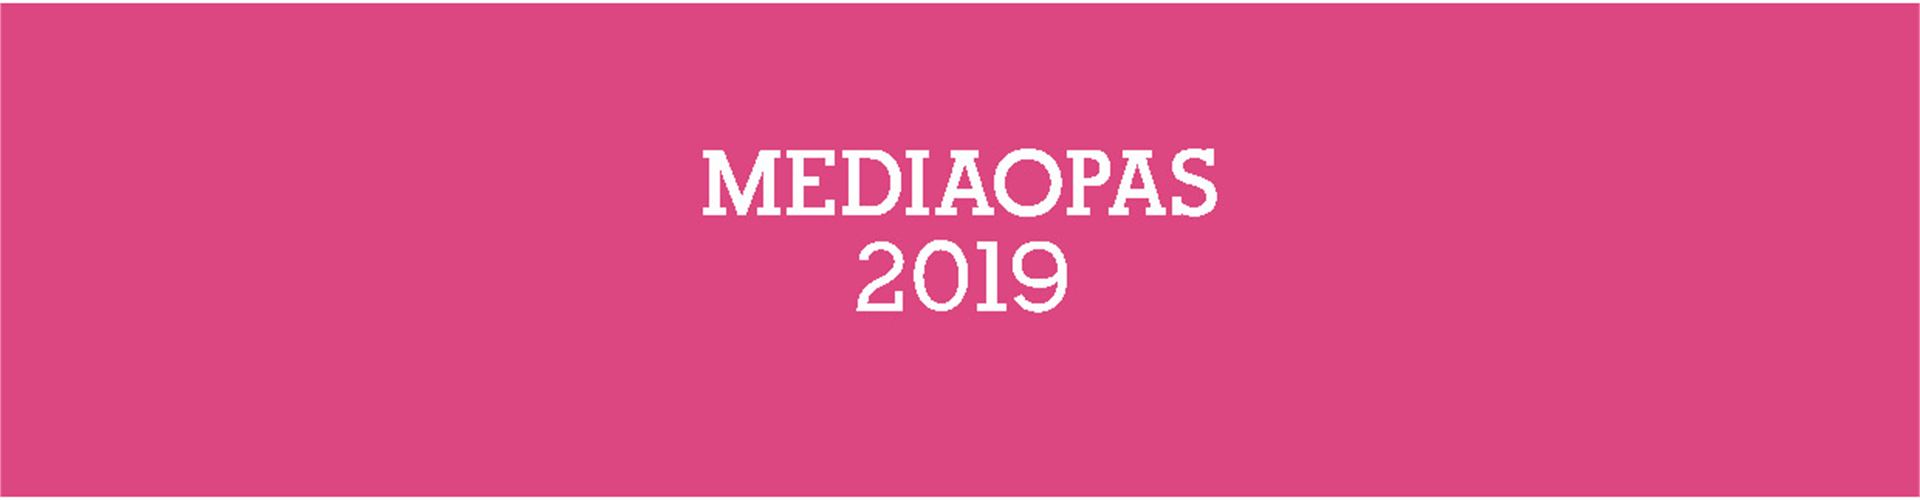 KPK Mediaopas 2019